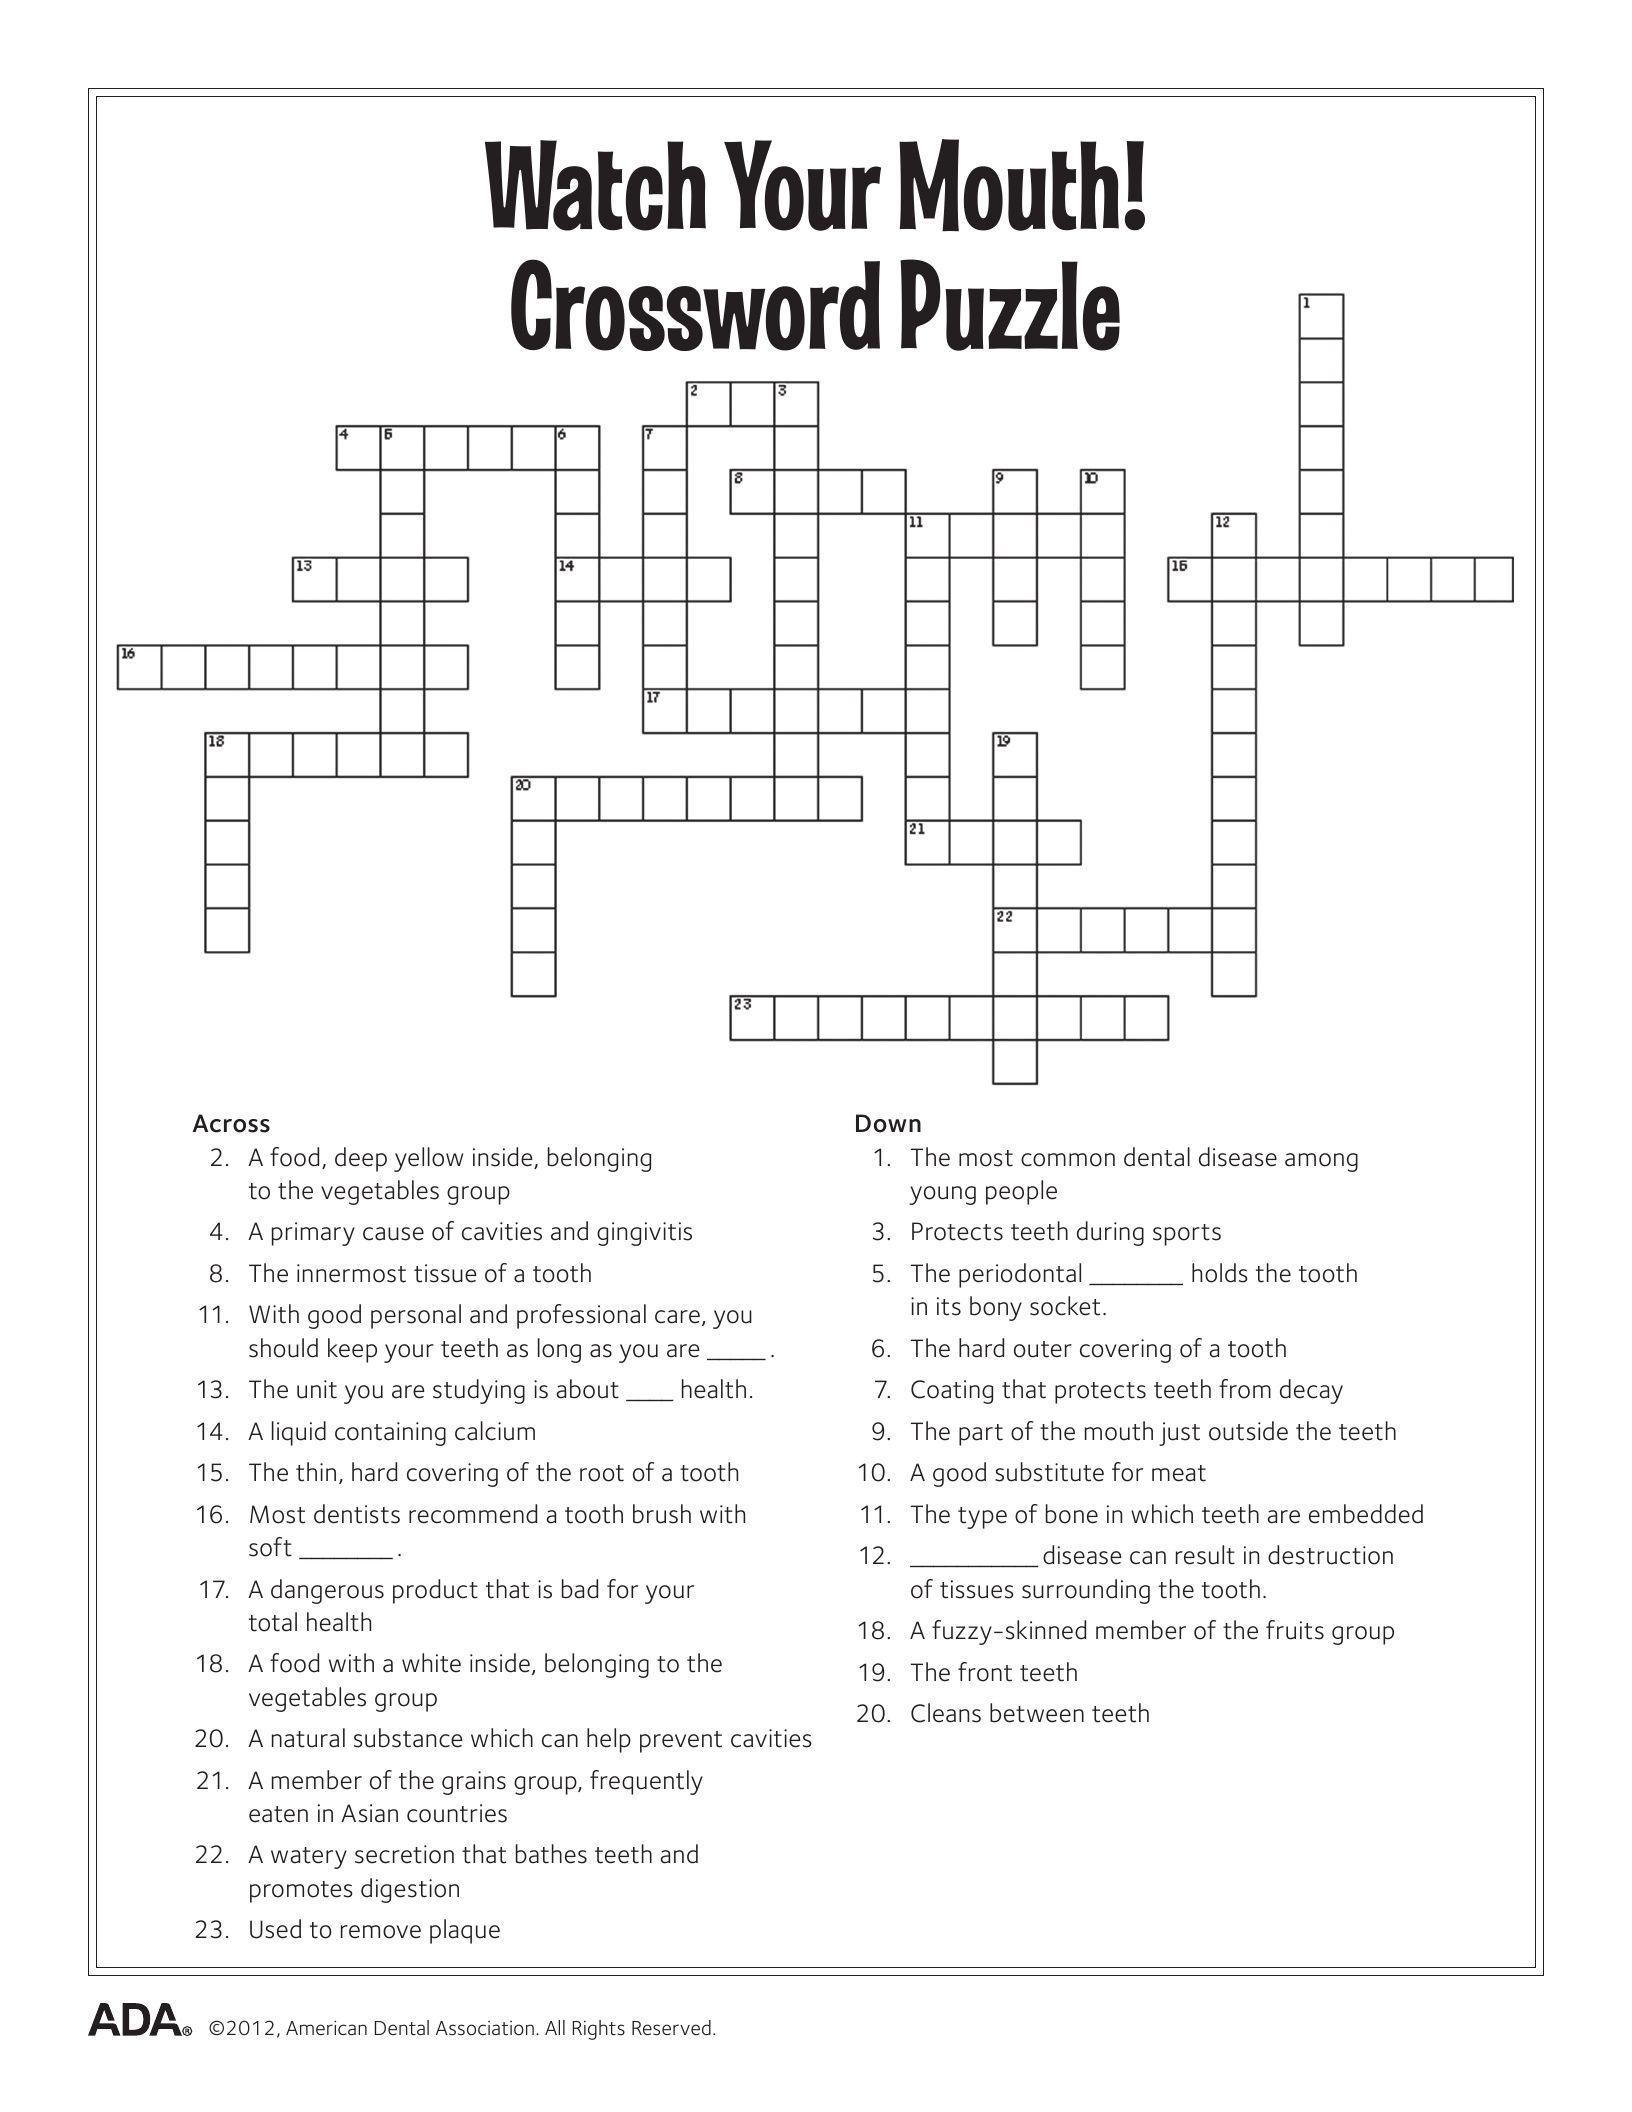 11 Dental Health Activities Puzzle Fun (Printable) | Dental Hygiene - Free Printable Crossword Puzzles Health